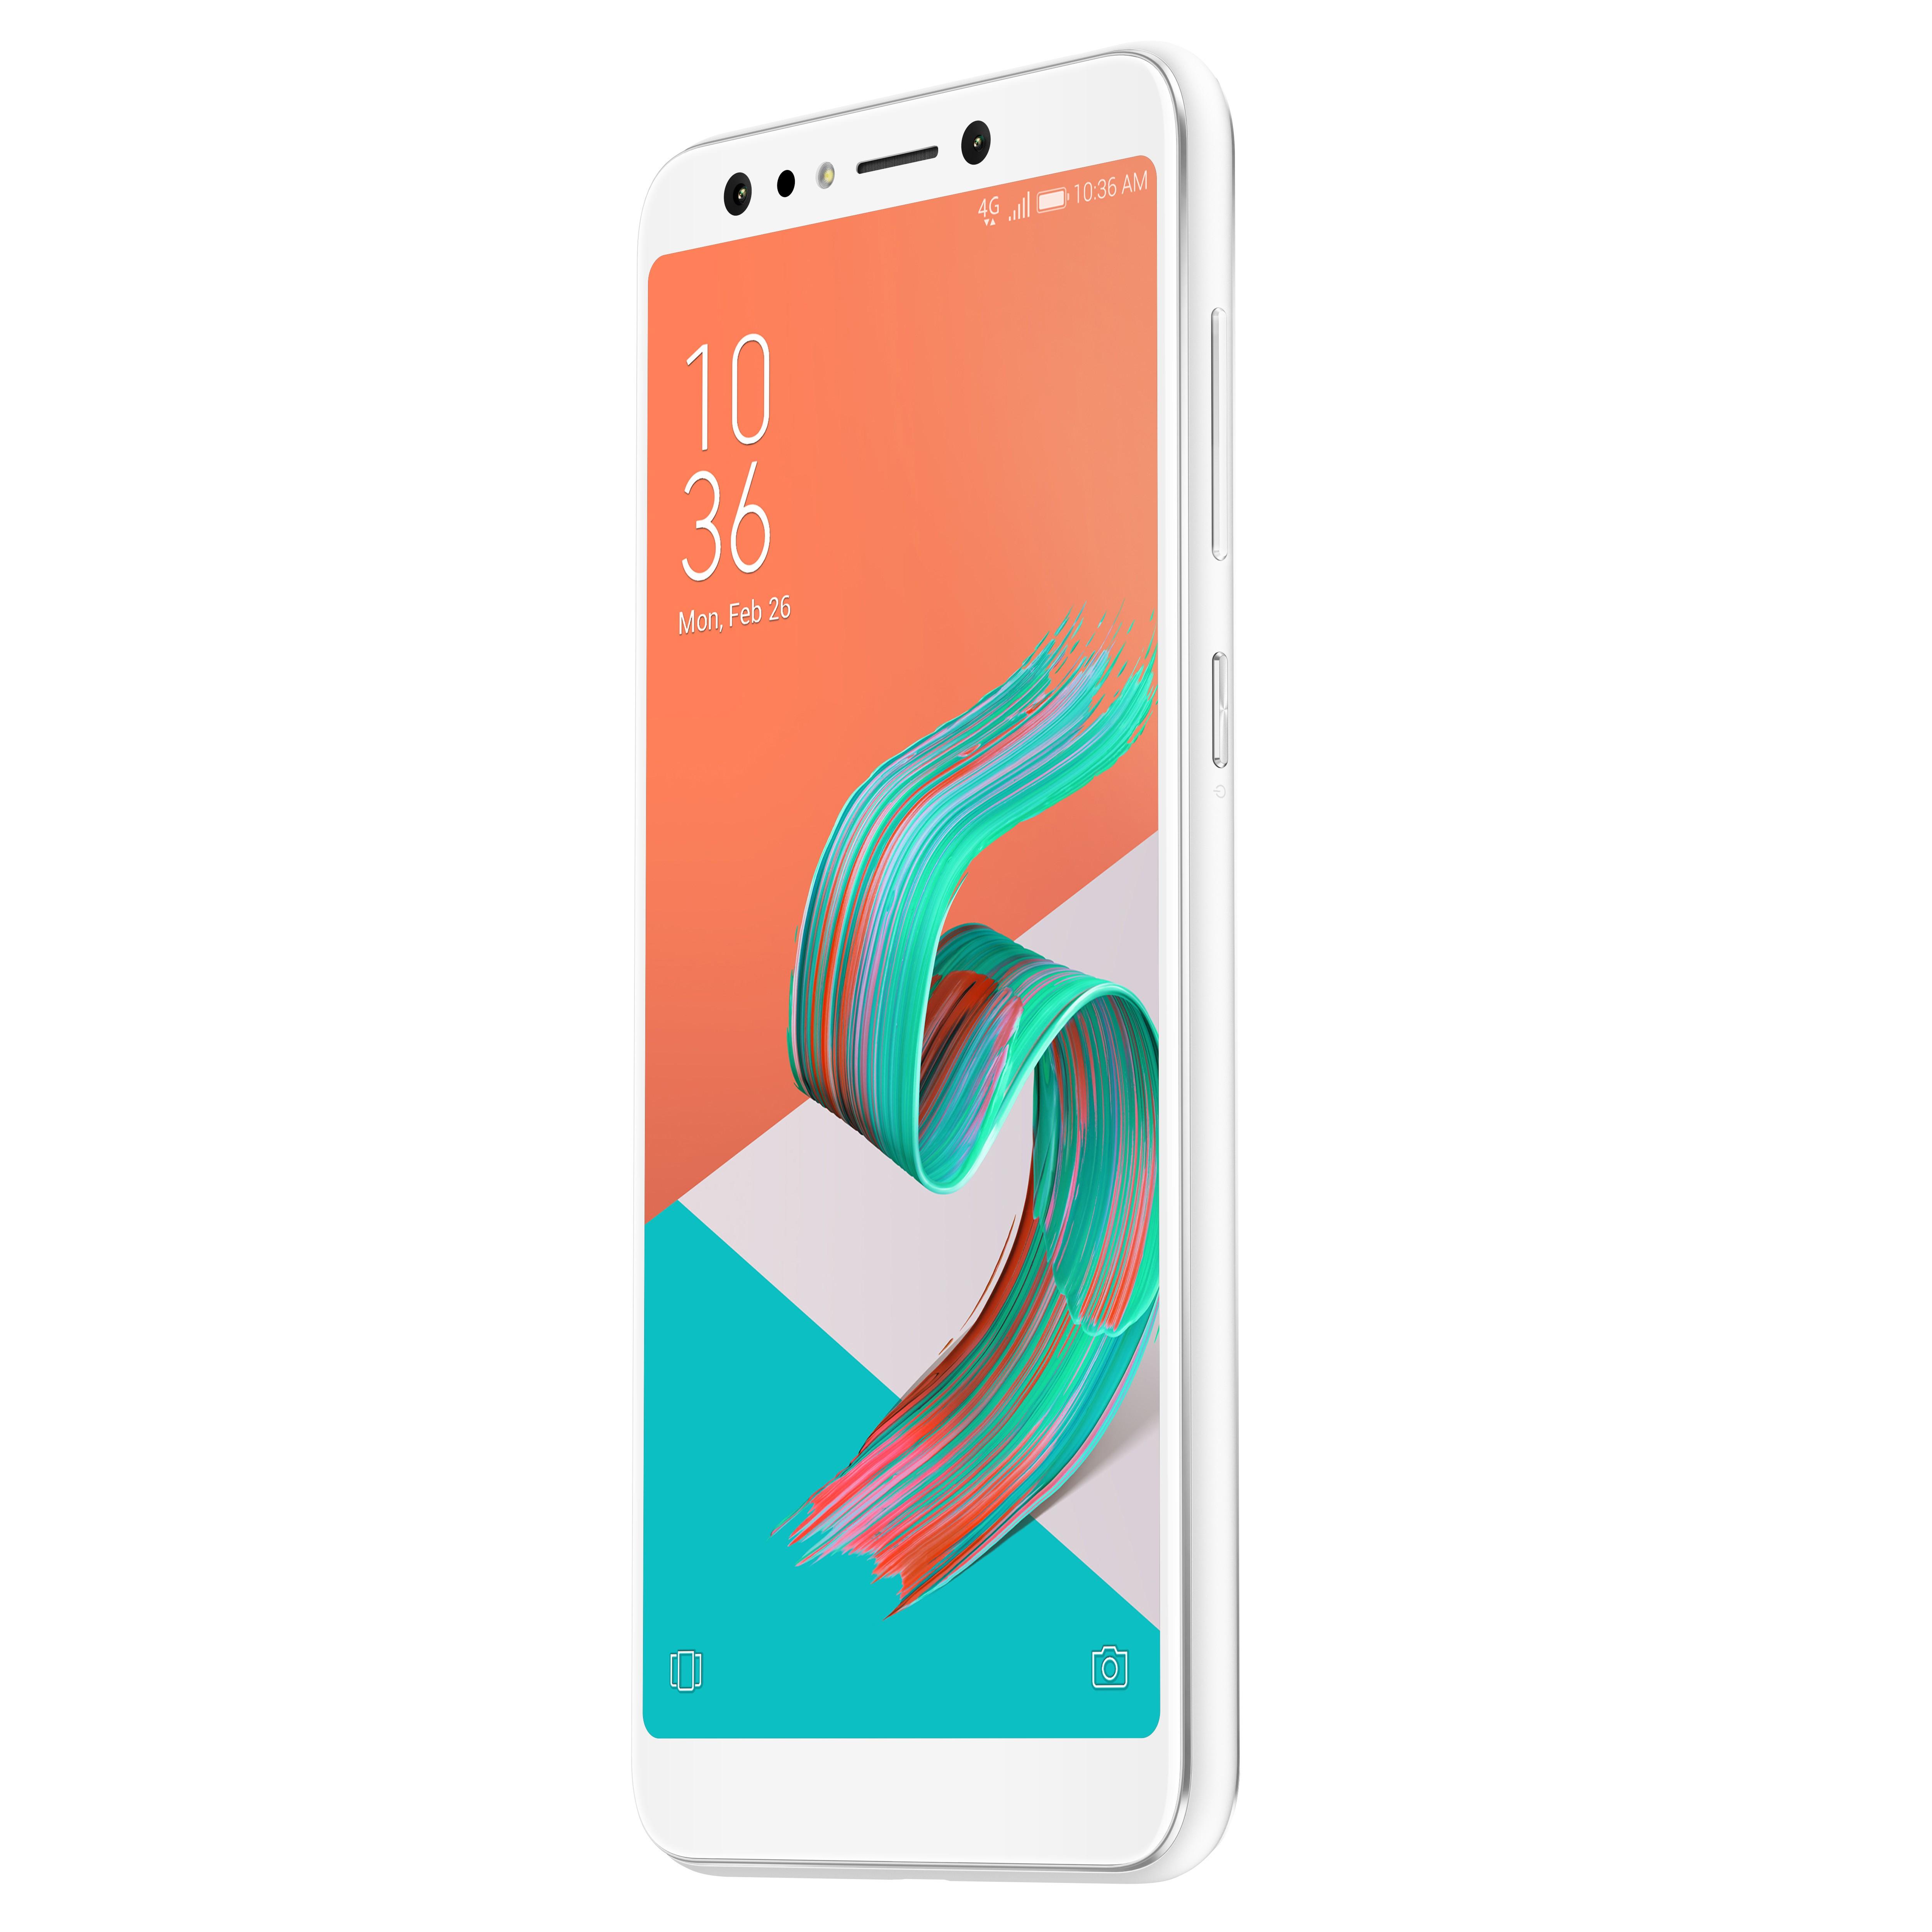 Celular ASUS Selfie Pro 5Q DS 4G Blanco Alkomprar.com